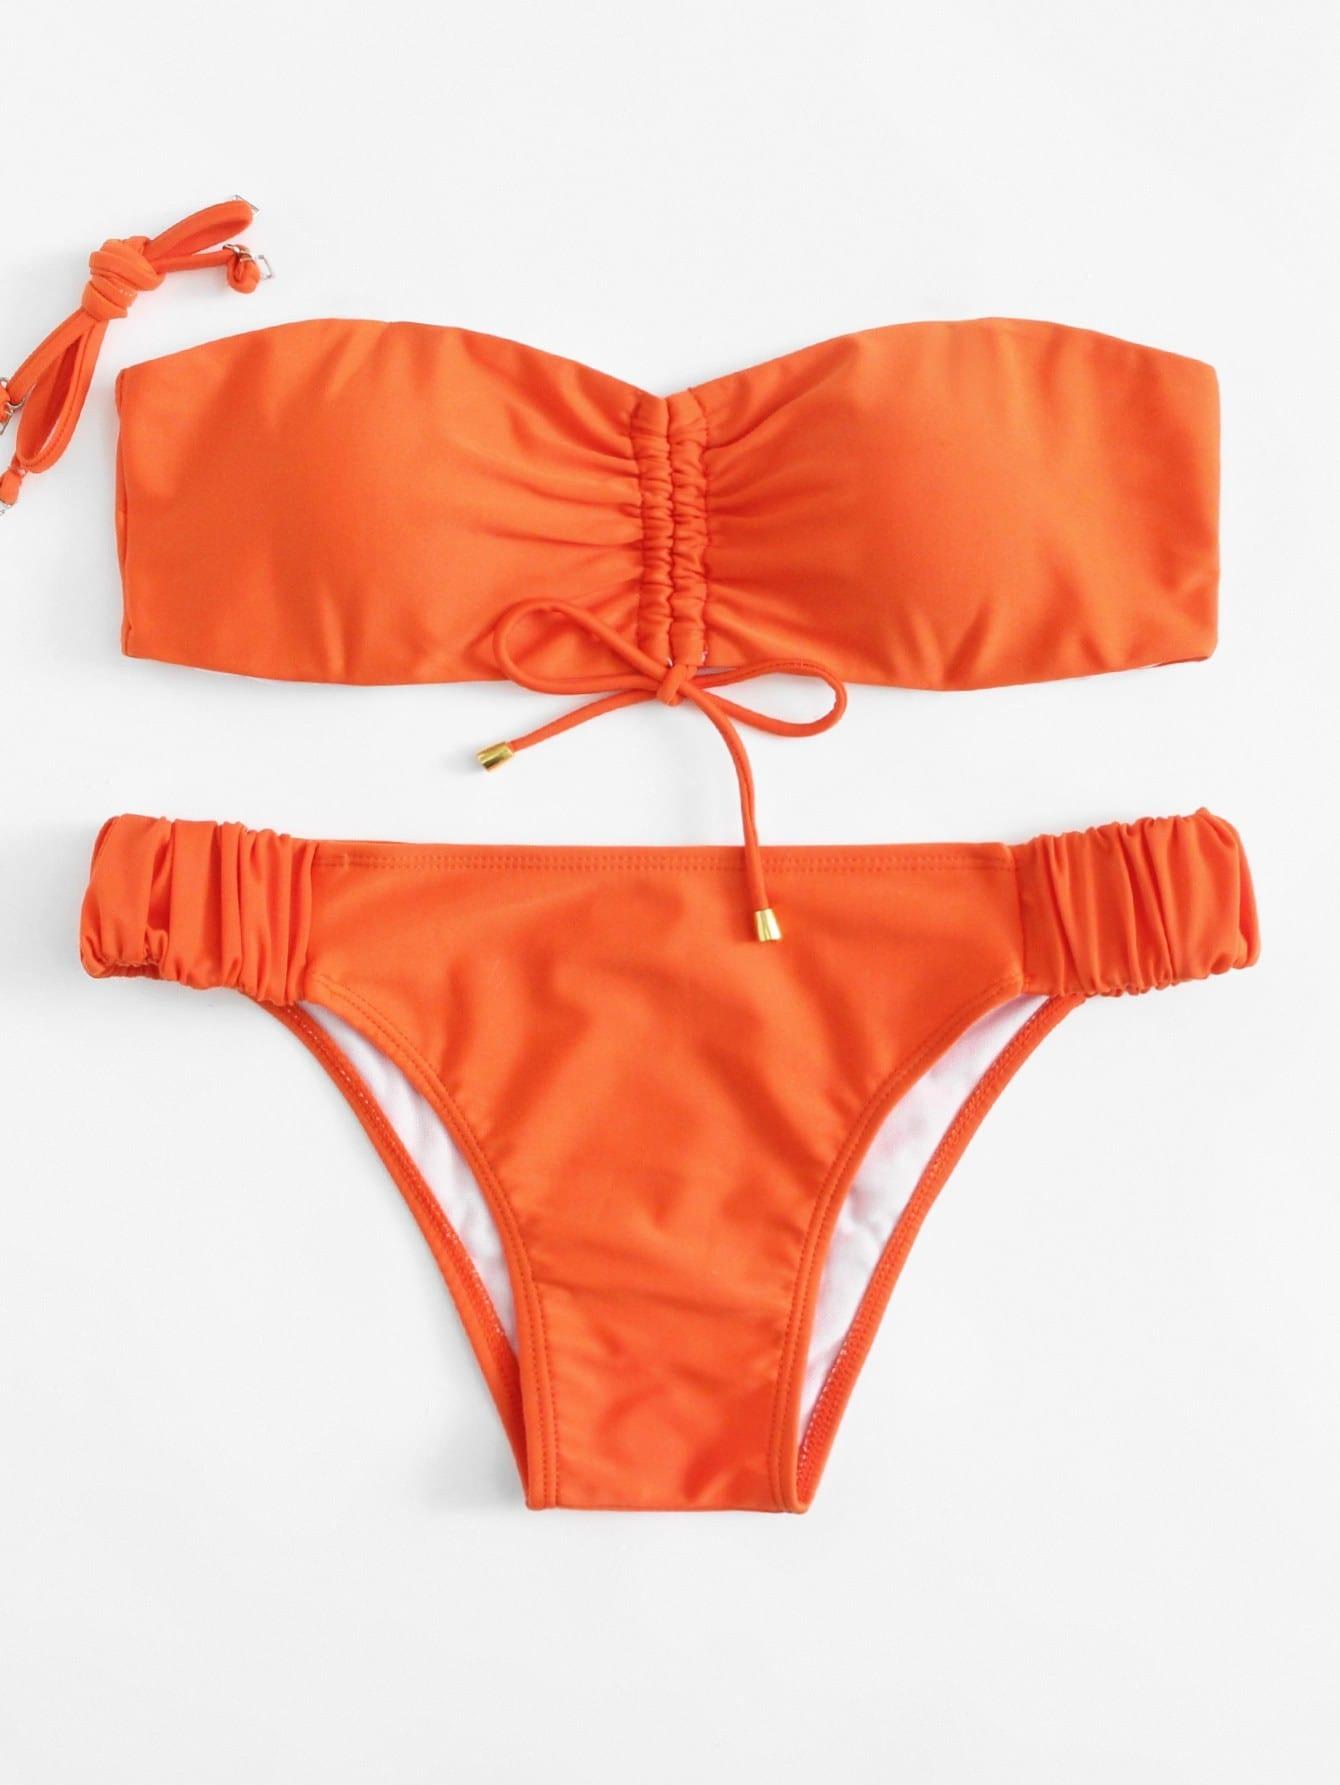 Bandeau Bikini Set With Detachable Strap